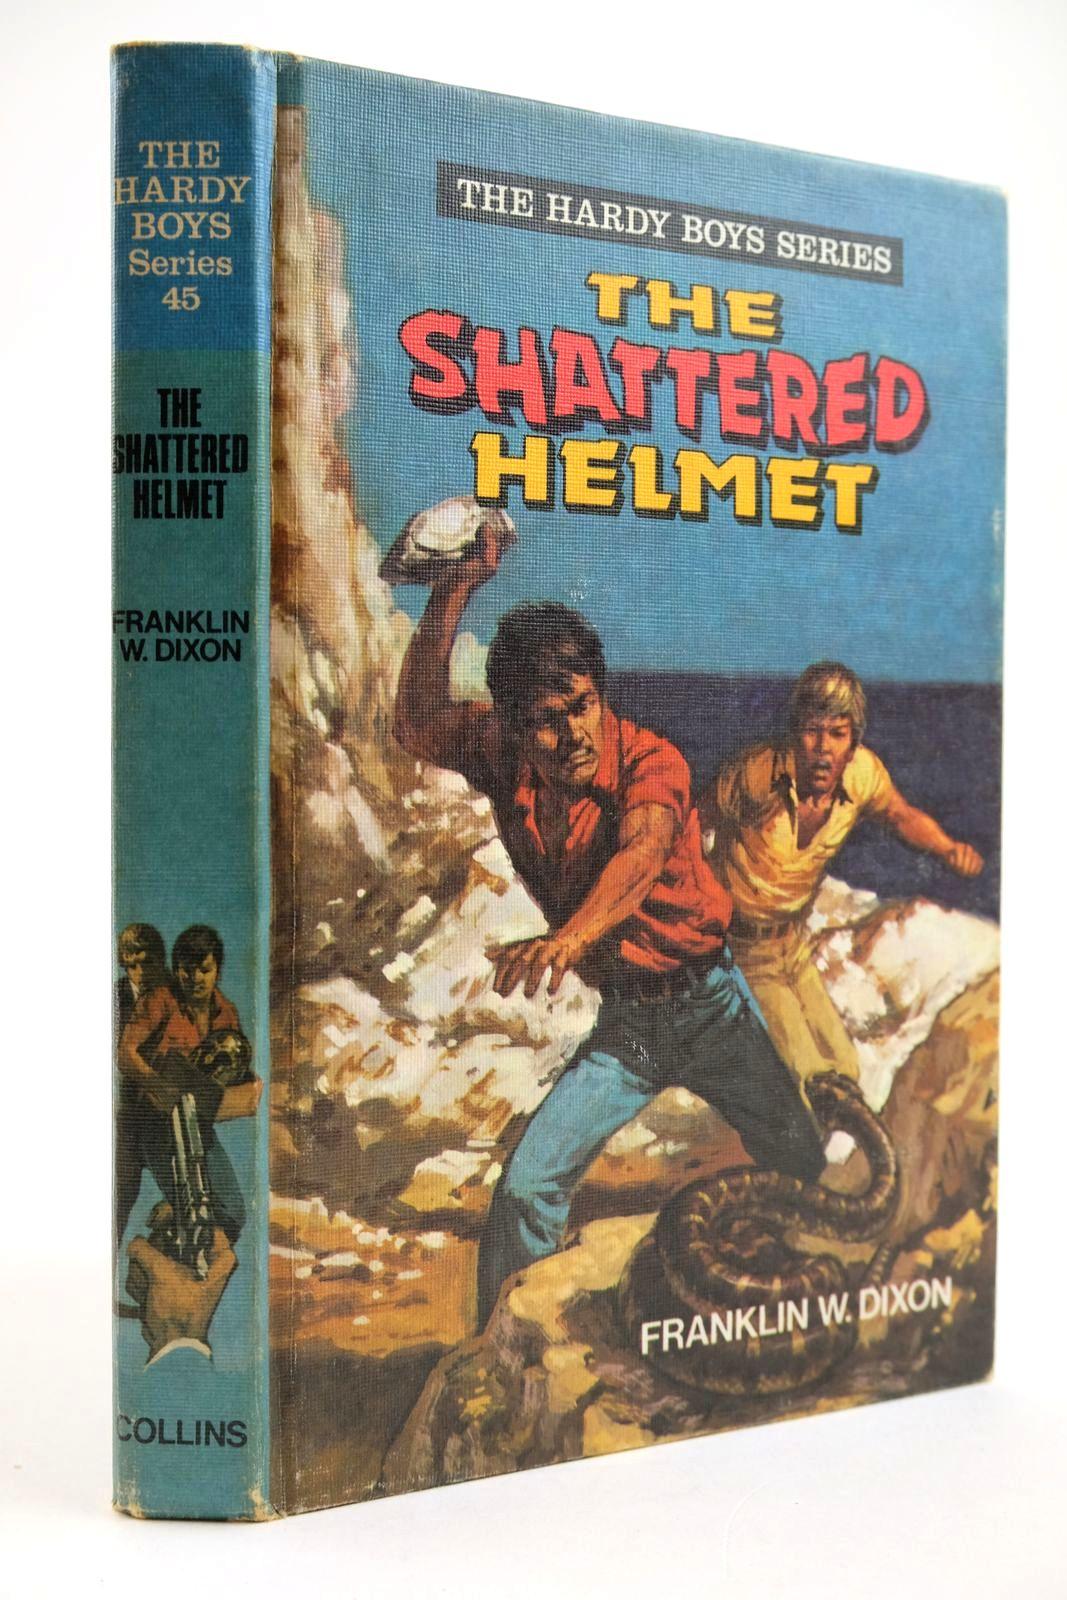 Photo of THE SHATTERED HELMET